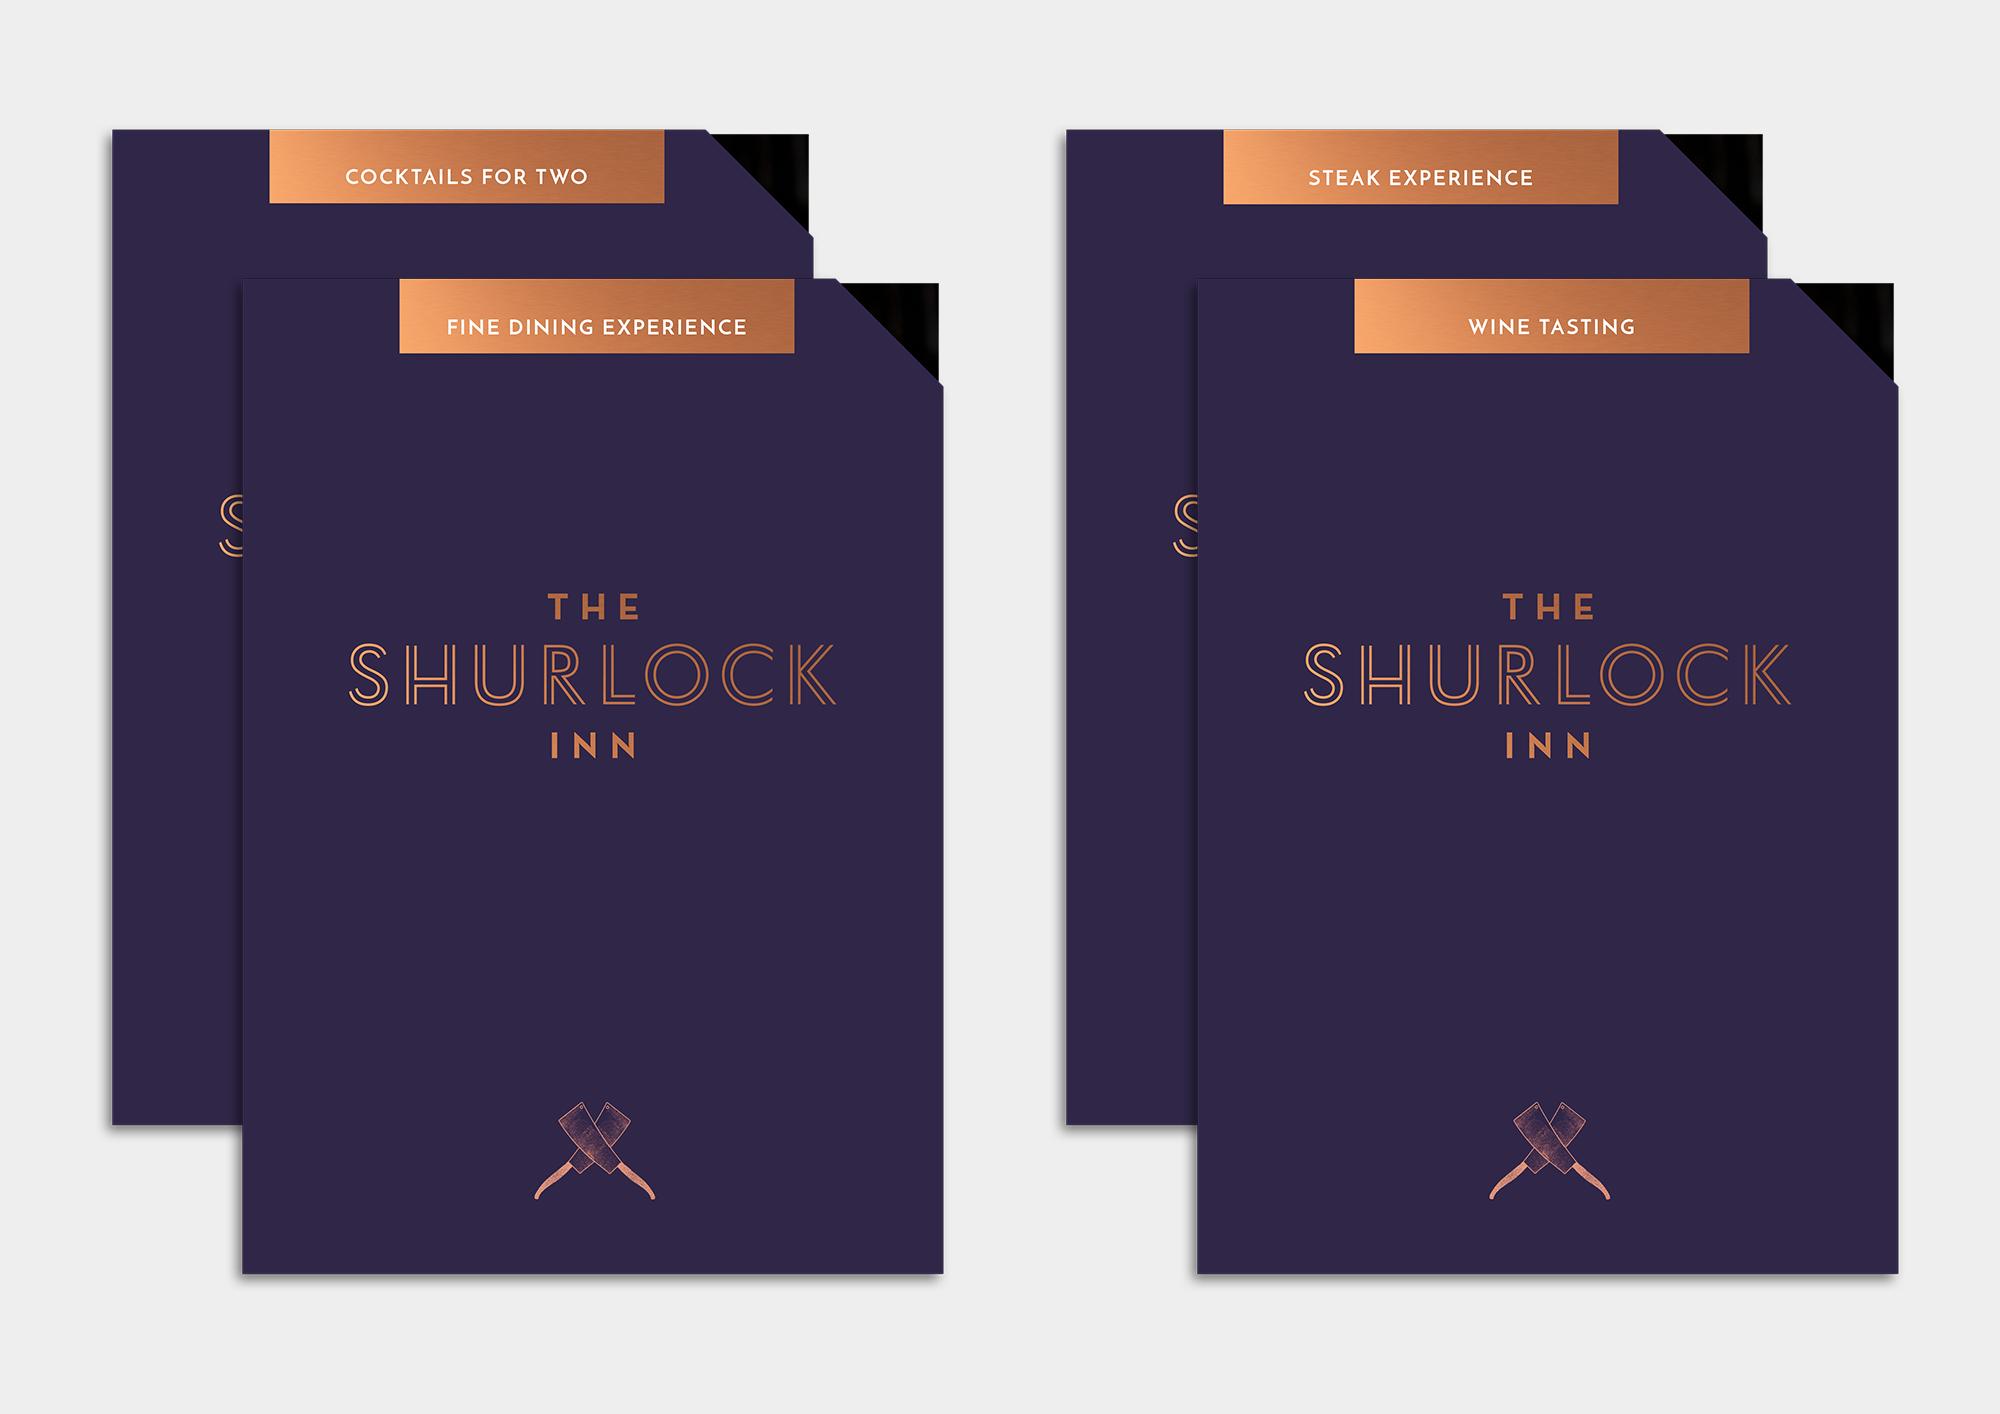 The-Shurlock-Inn-case-study-3